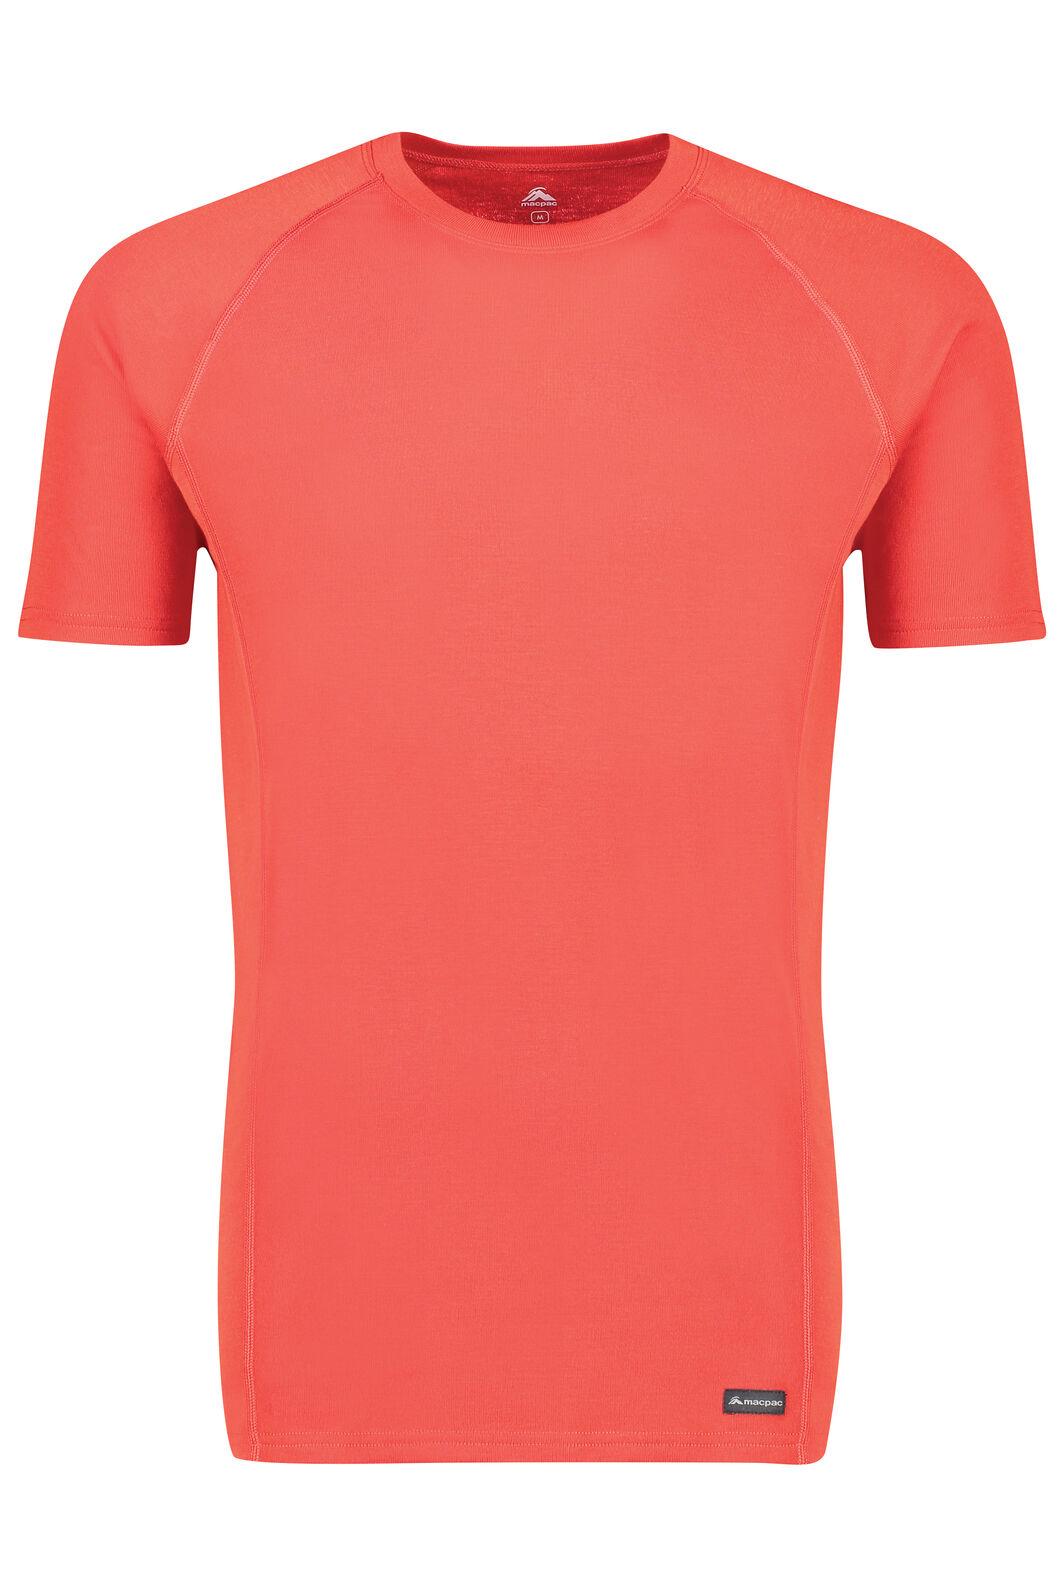 Macpac Geothermal Short Sleeve Top - Men's, Pompeian, hi-res